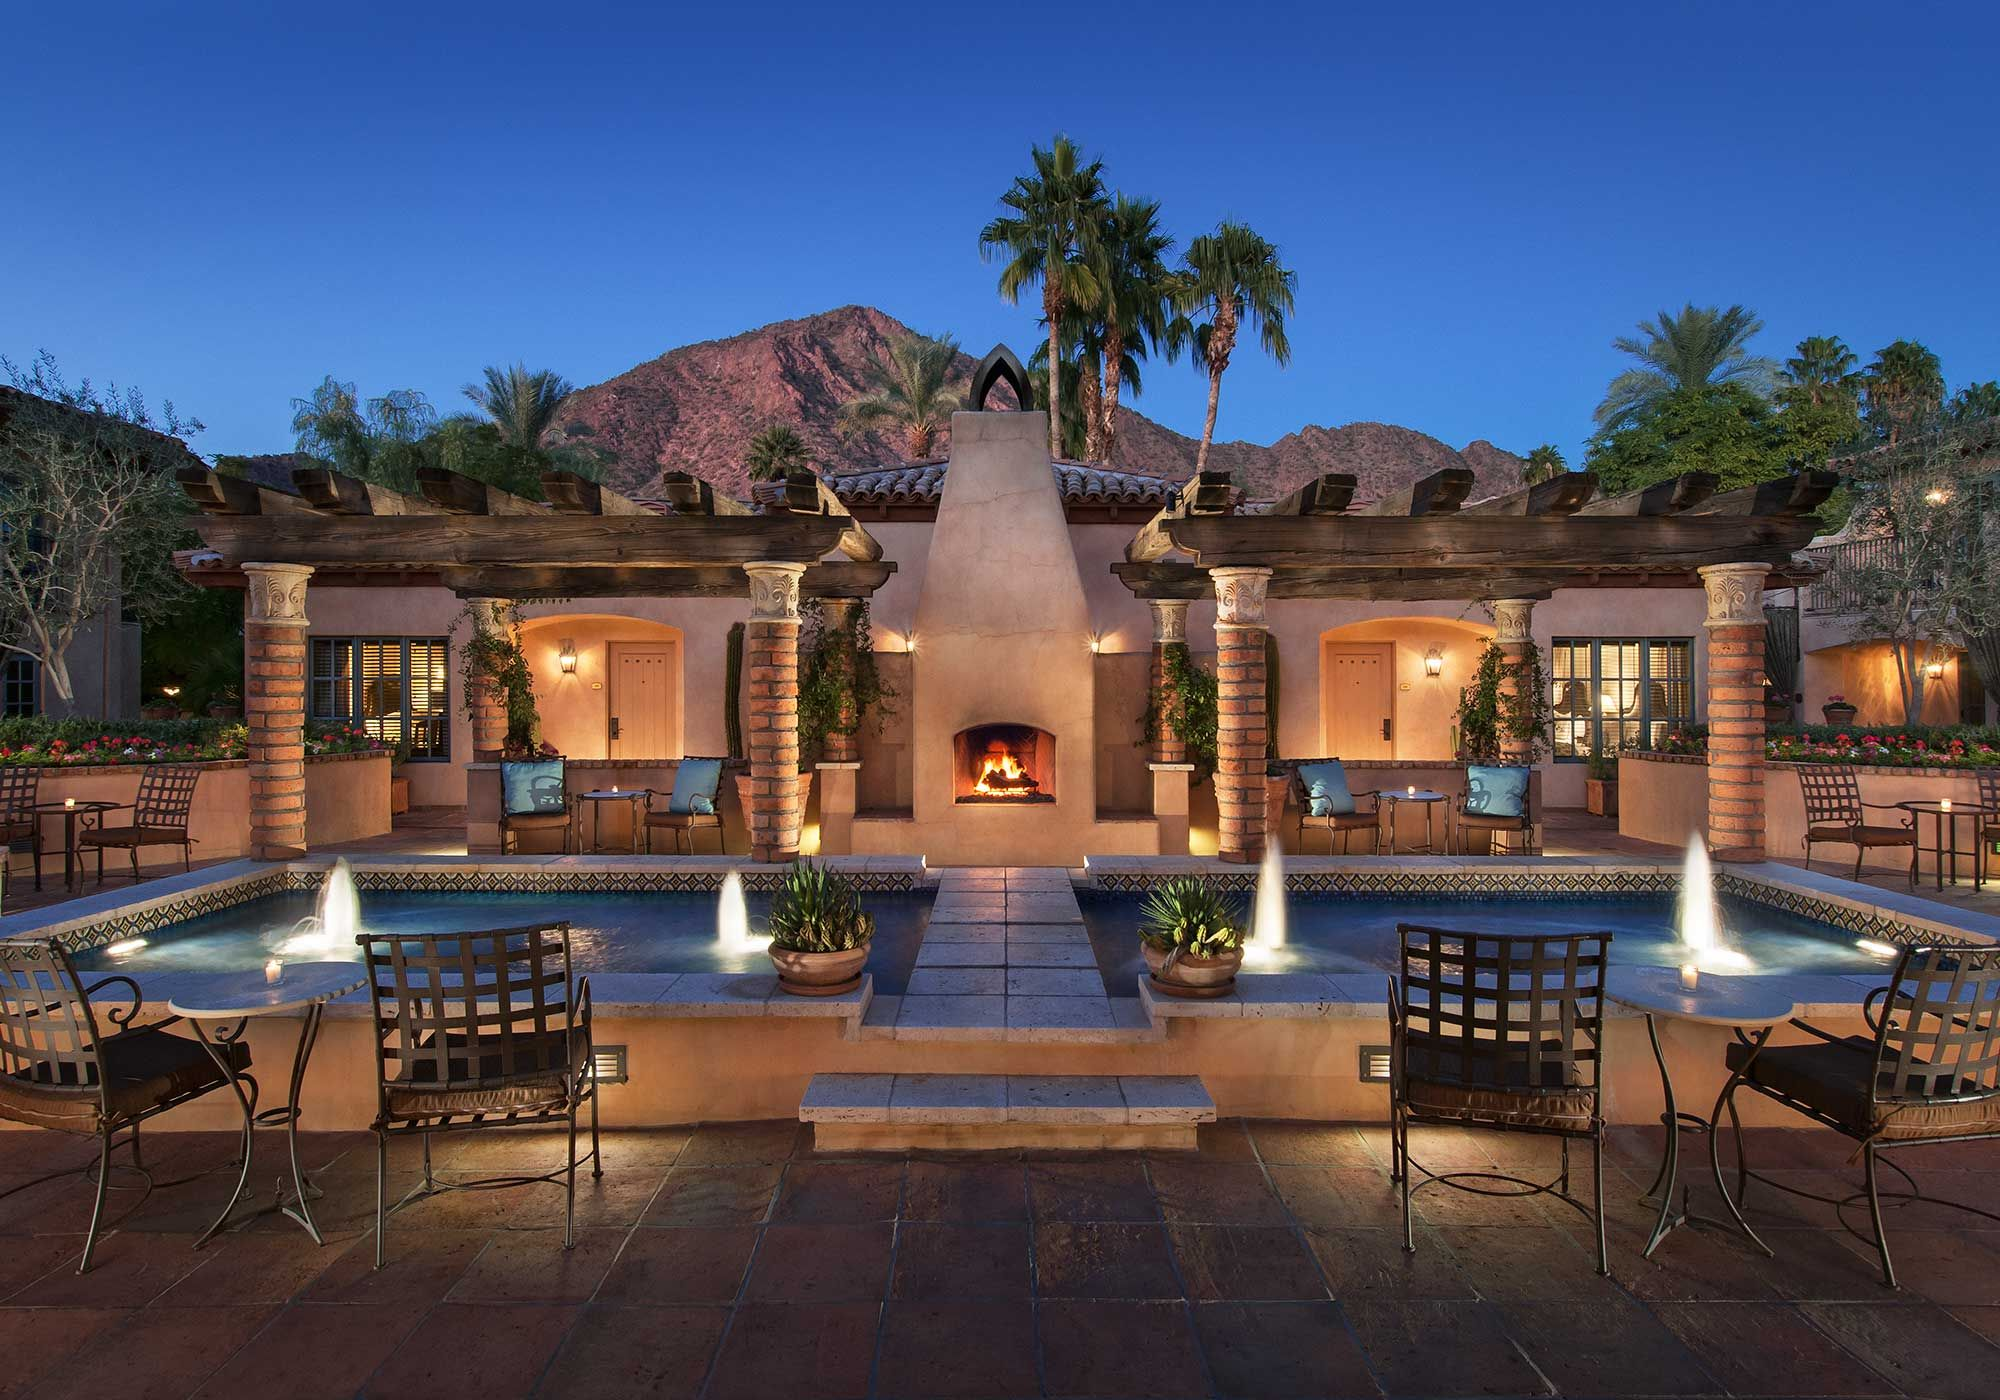 Best Kitchen Gallery: Phoenix Arizona Hotels Resorts Royal Palms Resort Spa Luxury of Hotels And Resorts In Phoenix Az  on rachelxblog.com